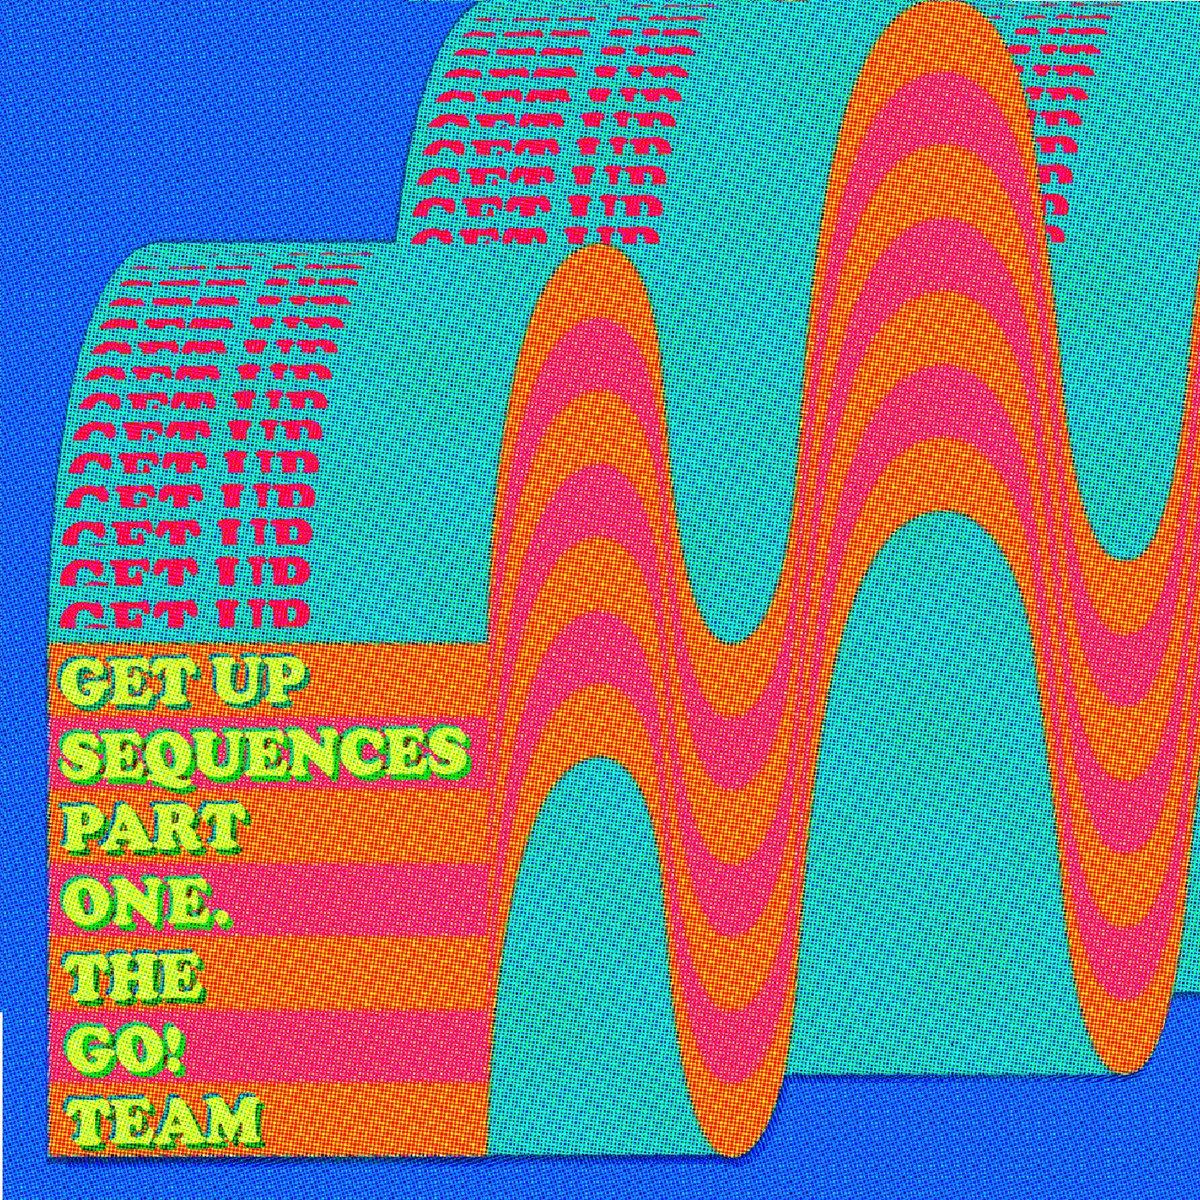 The Go! Team - Get Up Sequences Part One [LTD LP] (turquoise vinyl)